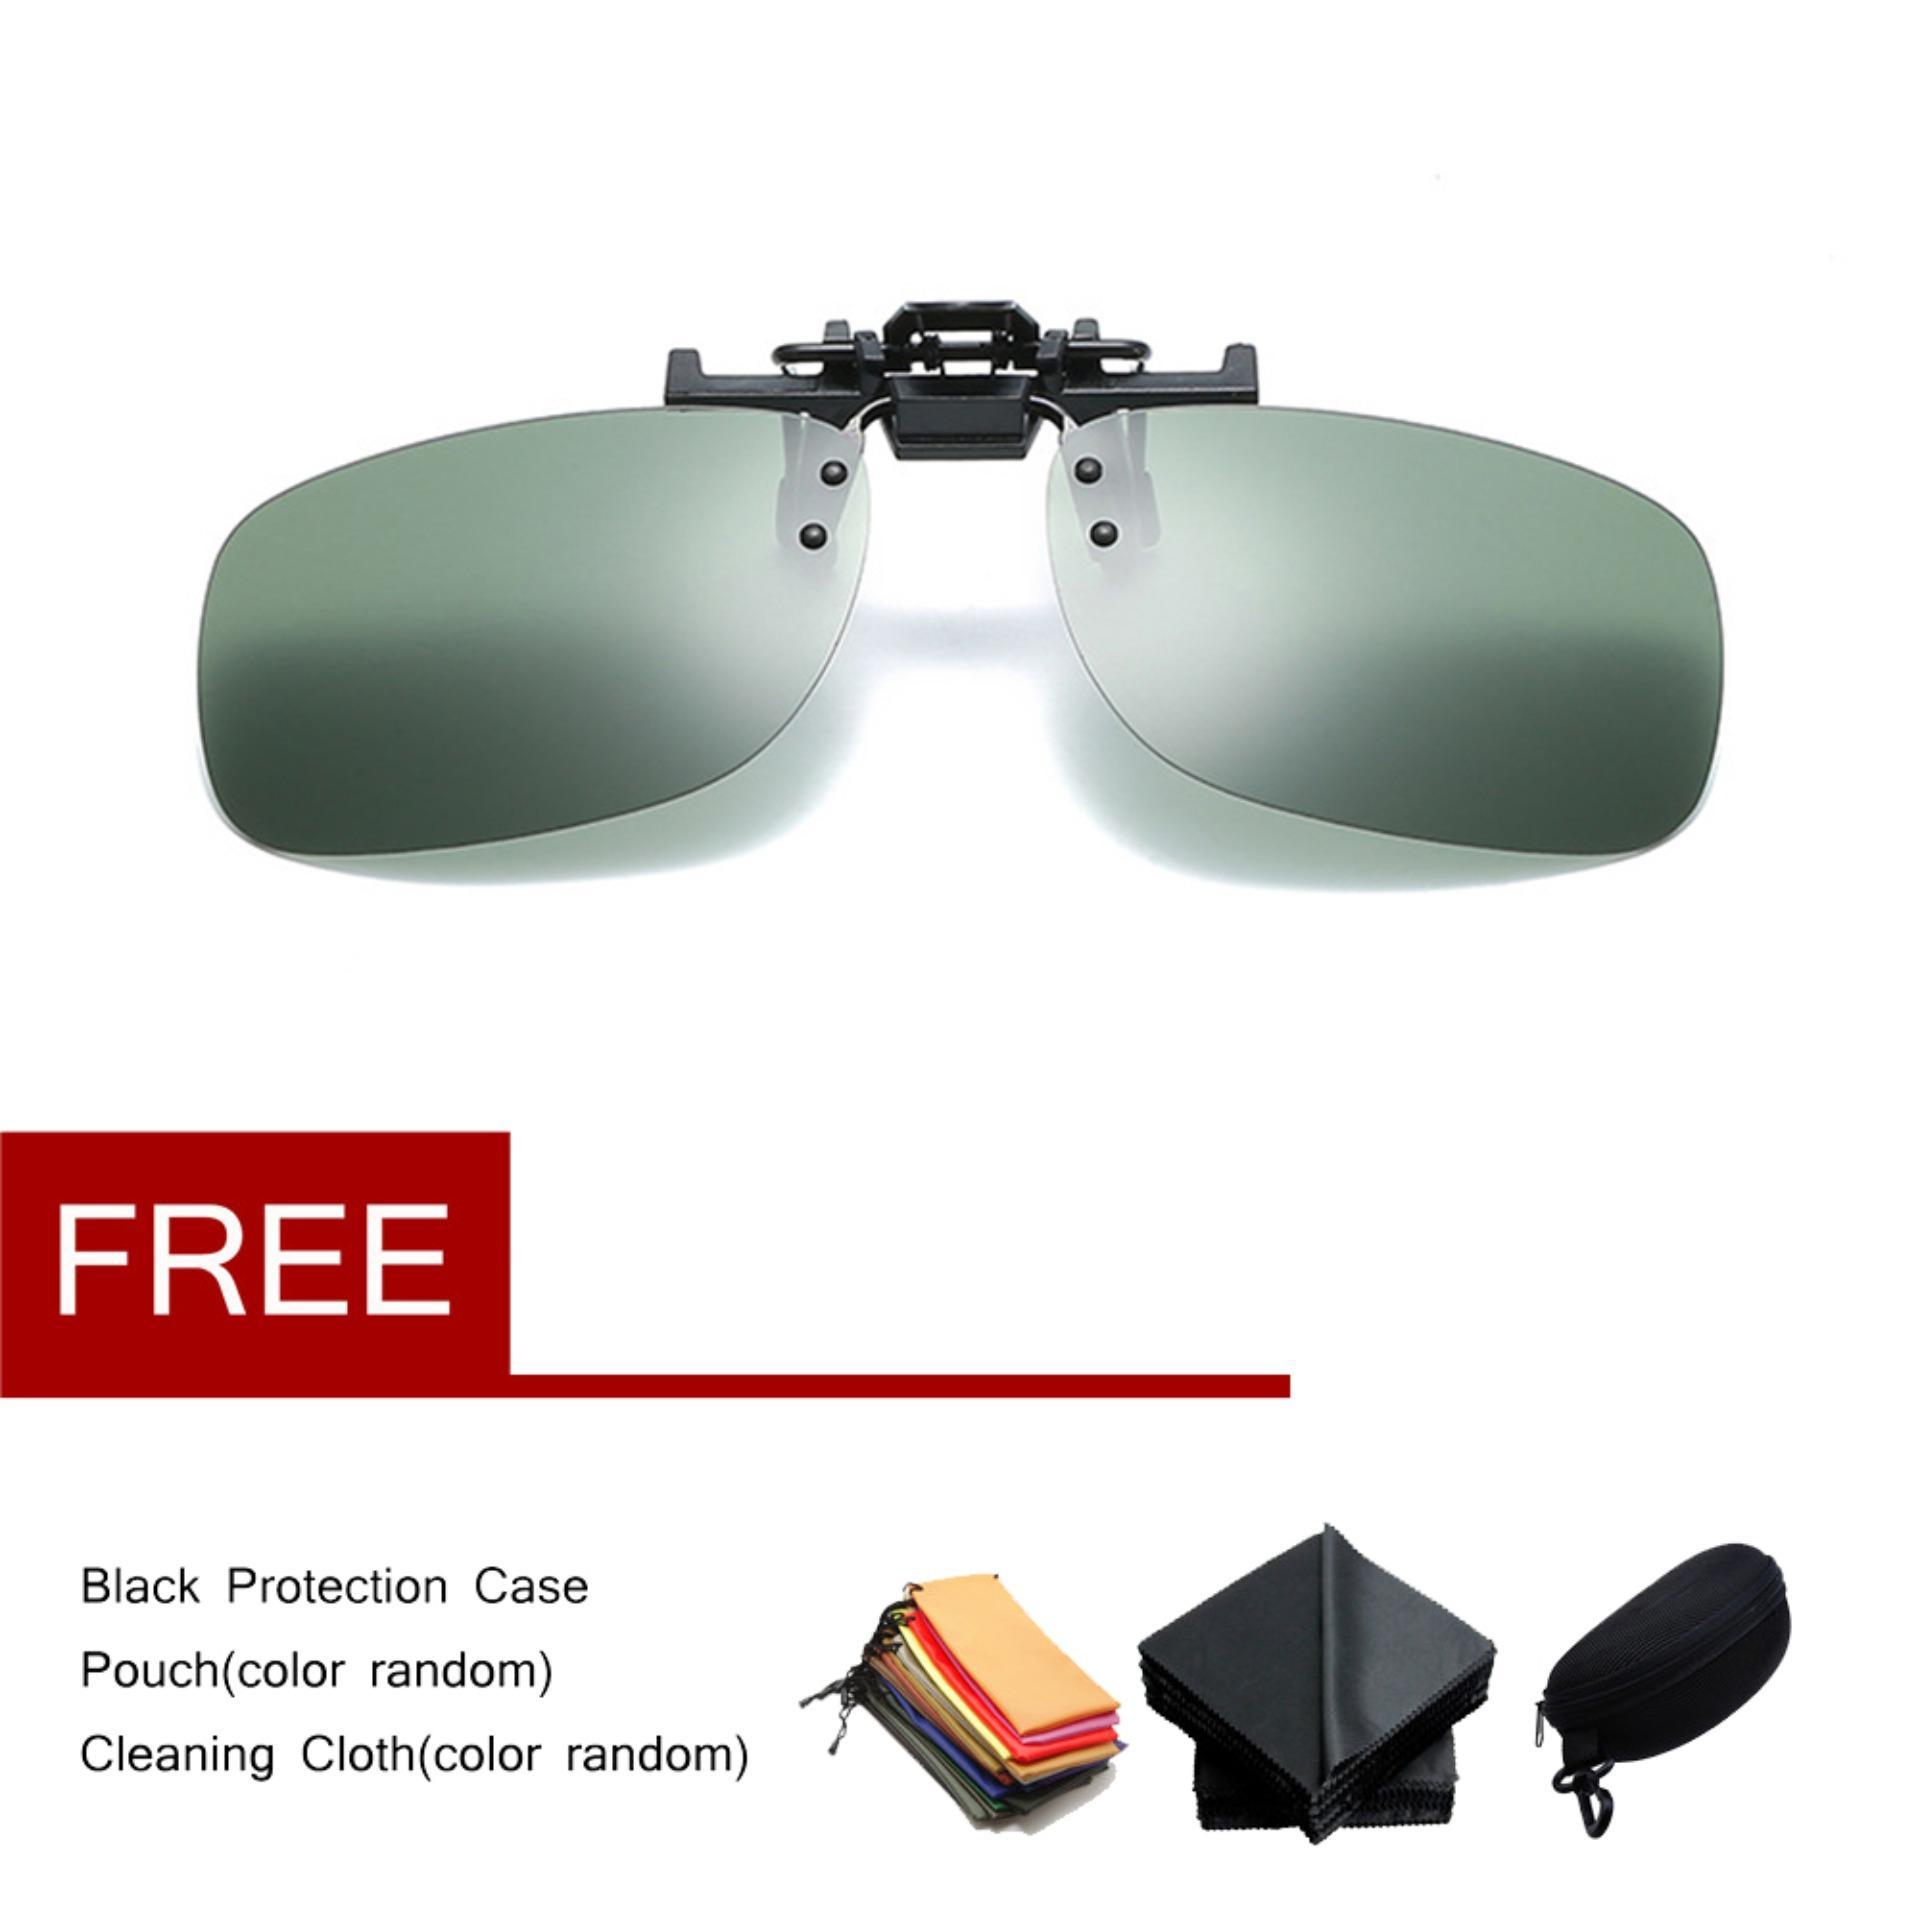 7026bc83f8 Hot Sale Fashion Polarized Lens UV400 Clip on Sunglasses Driving Glasses  Day Night Vision